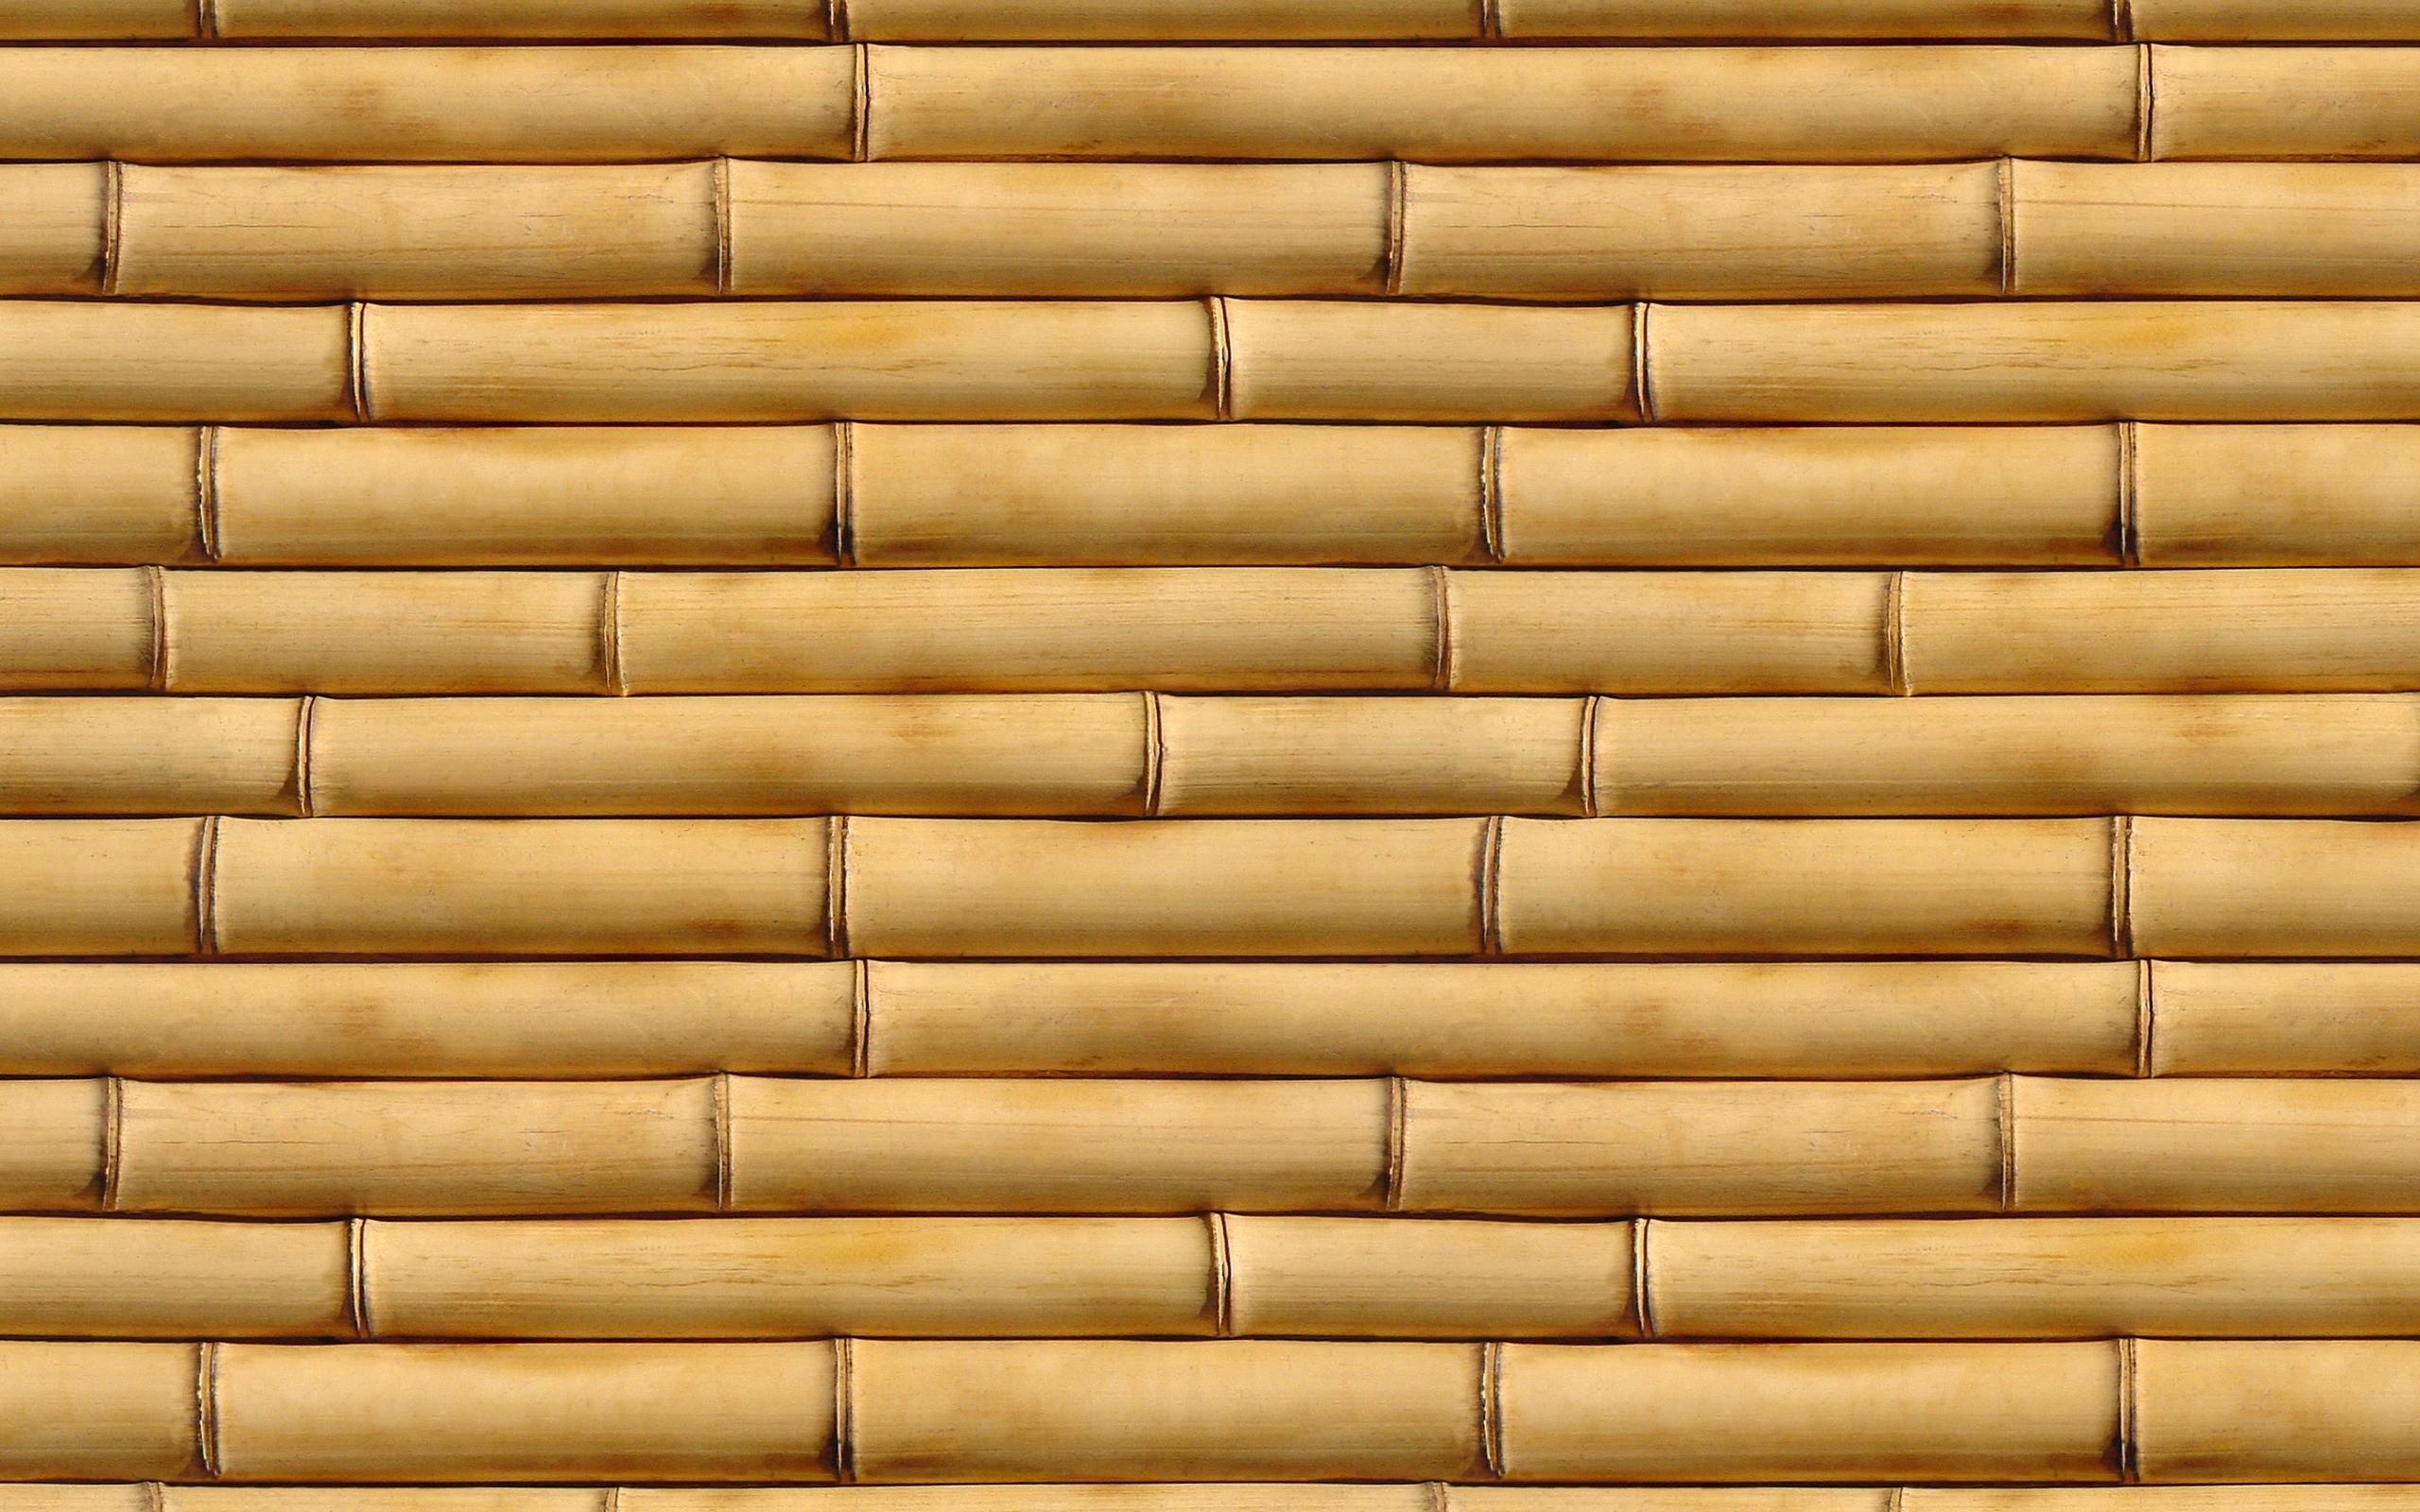 Fall Ceiling Wallpaper Hd Hd Bamboo Backgrounds Download Pixelstalk Net